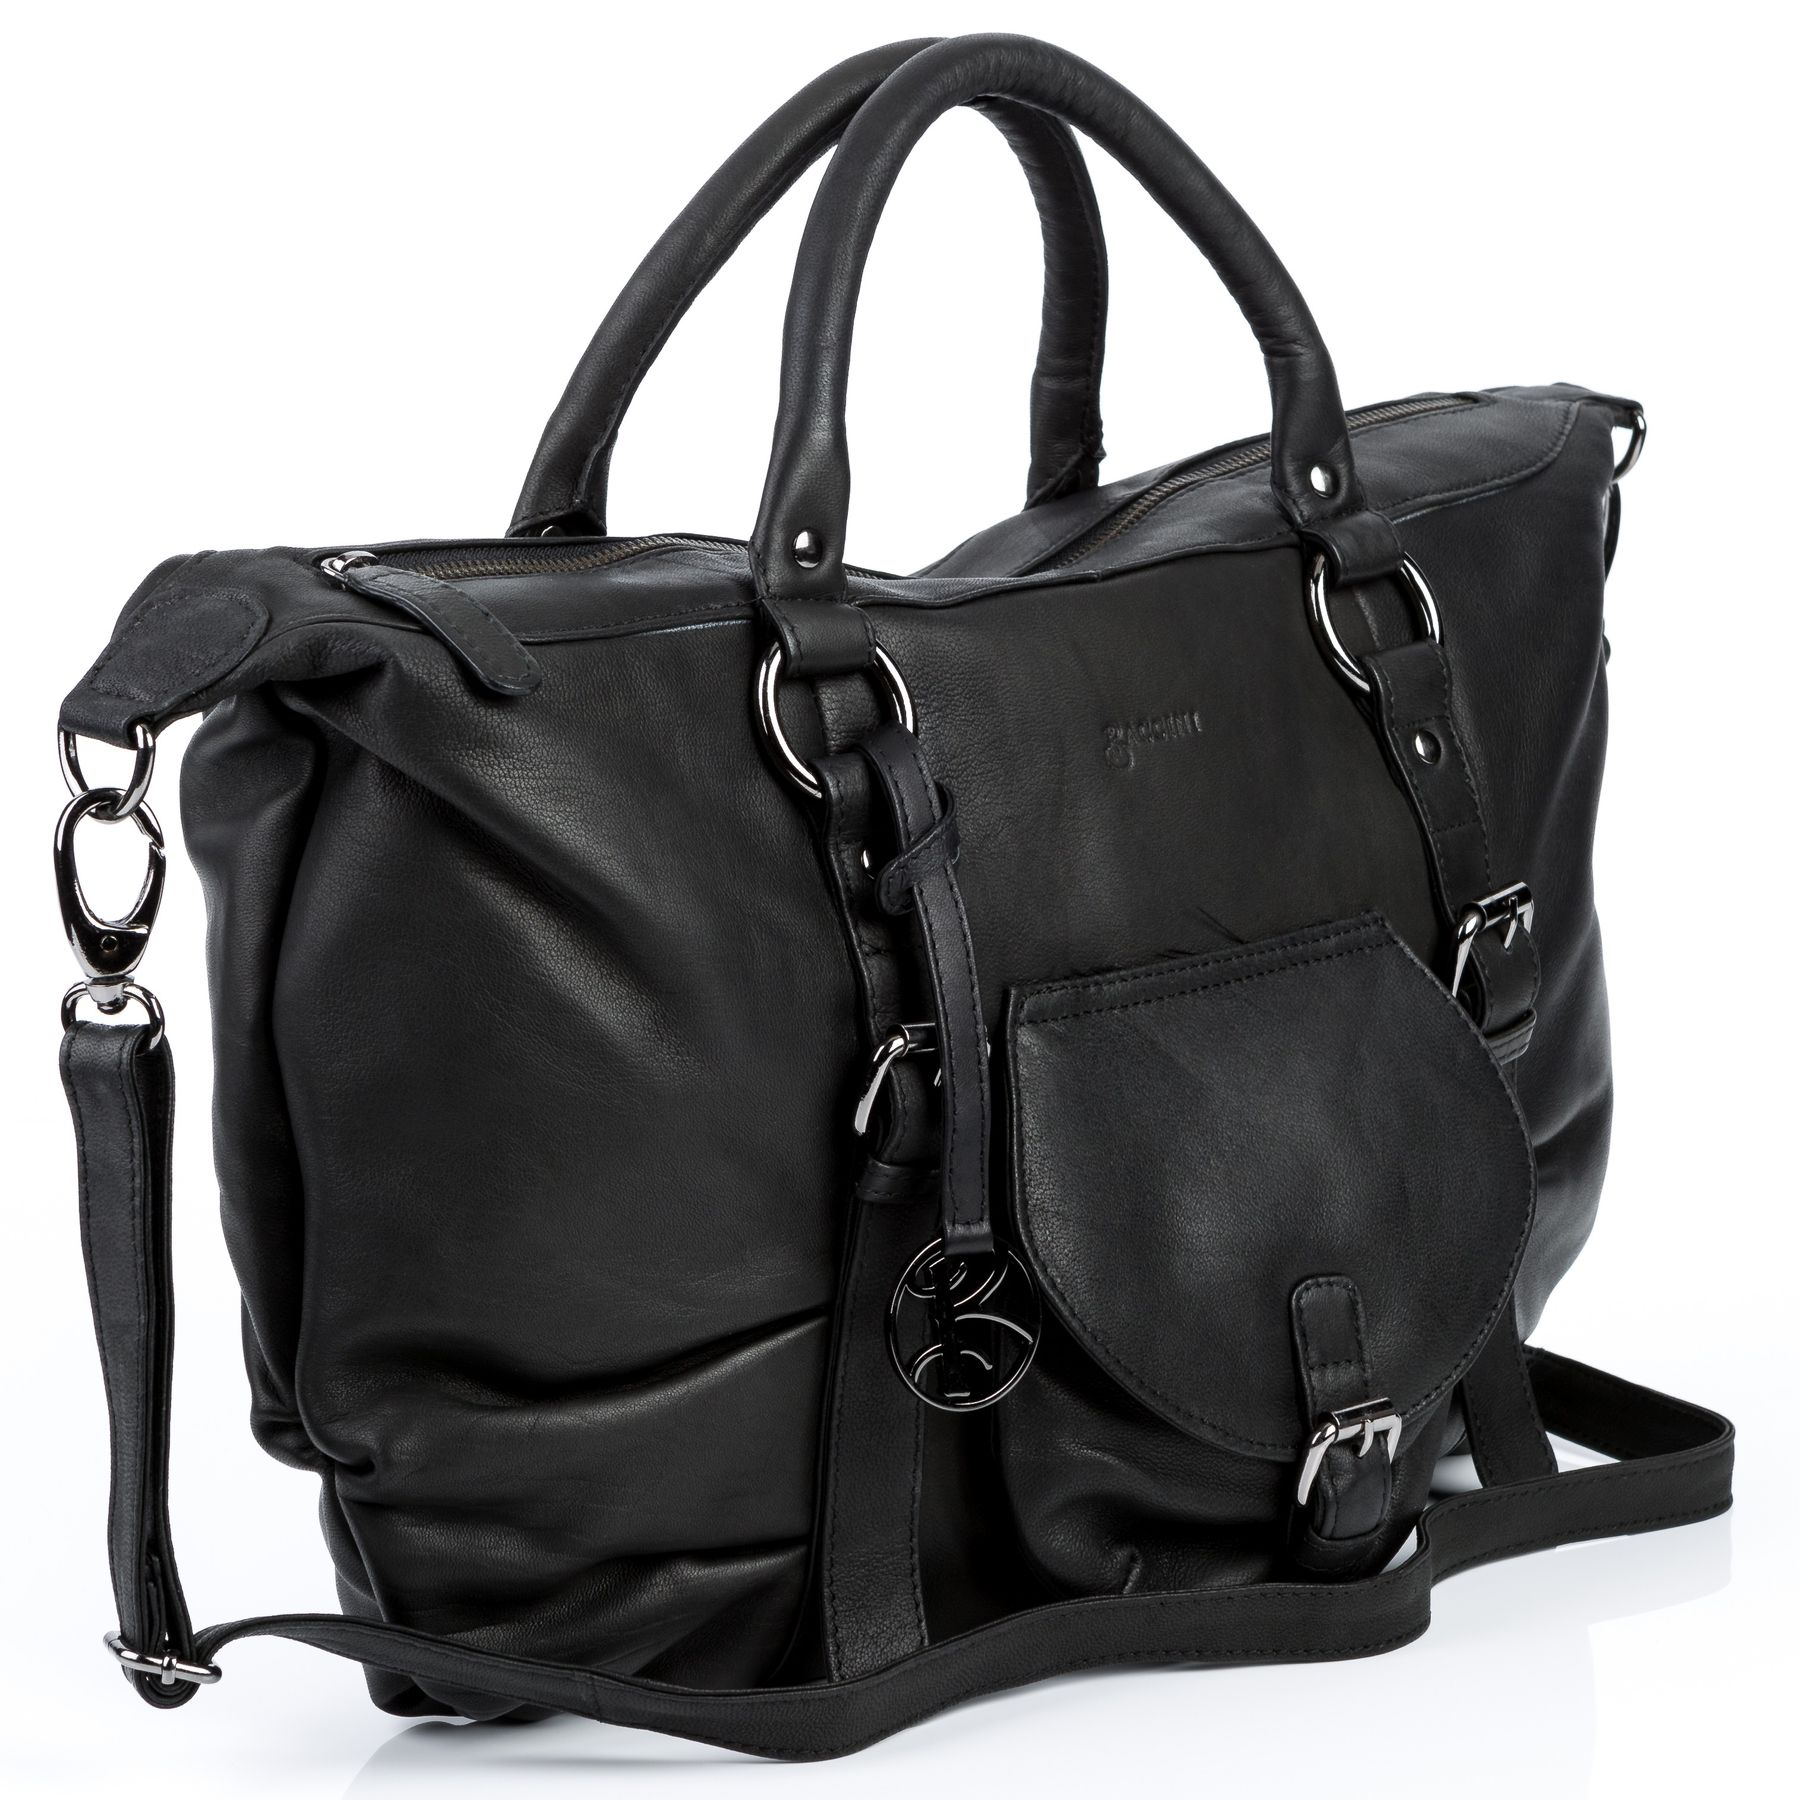 29afdb9910ad5 BACCINI top-handle tote bag Sheep Leather ZOE black shoulder bag ...